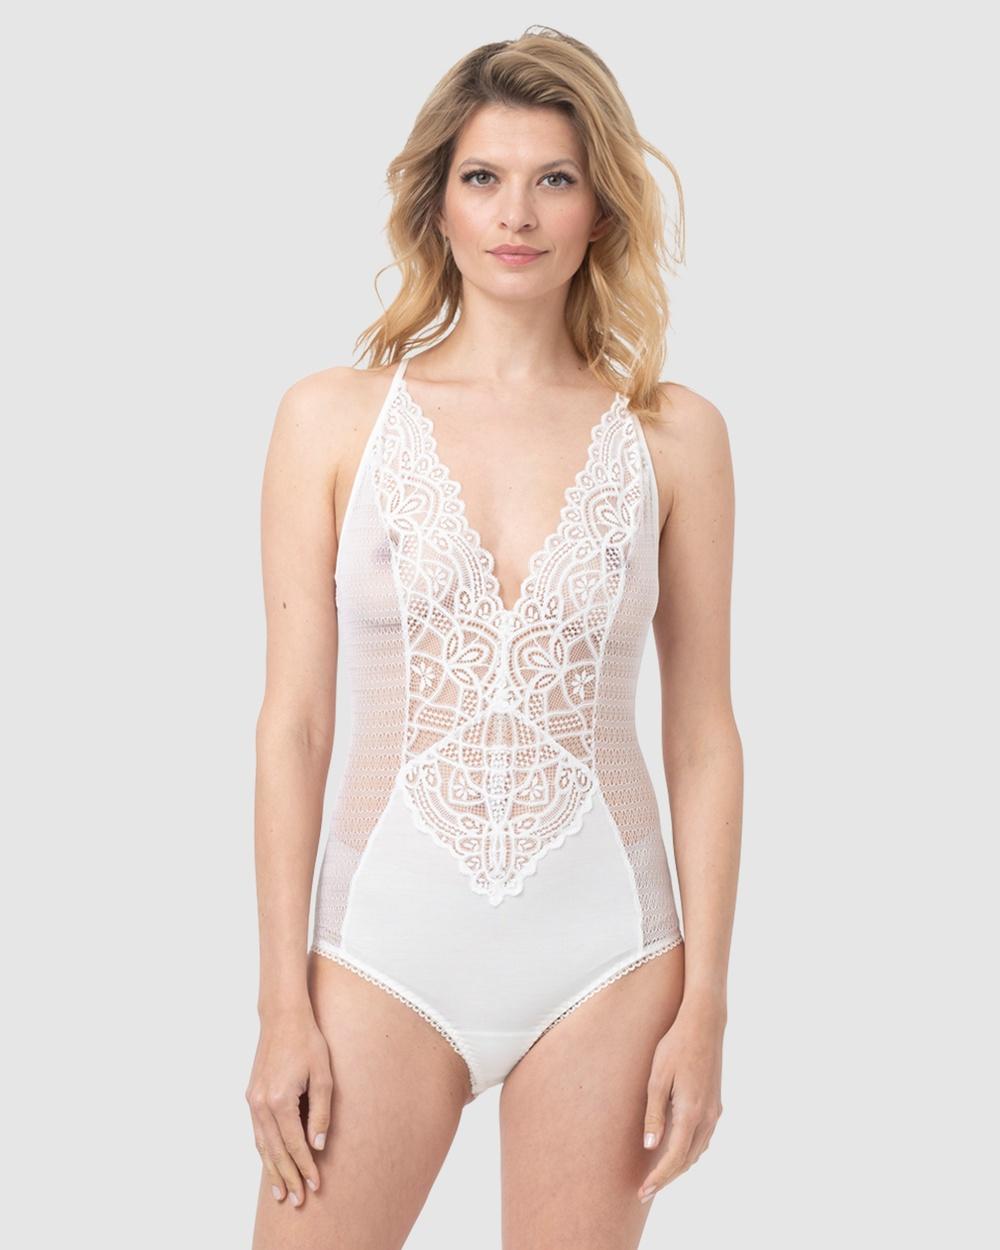 Oh!Zuza Lace Bodysuit Sleepwear & Loungewear Ivory